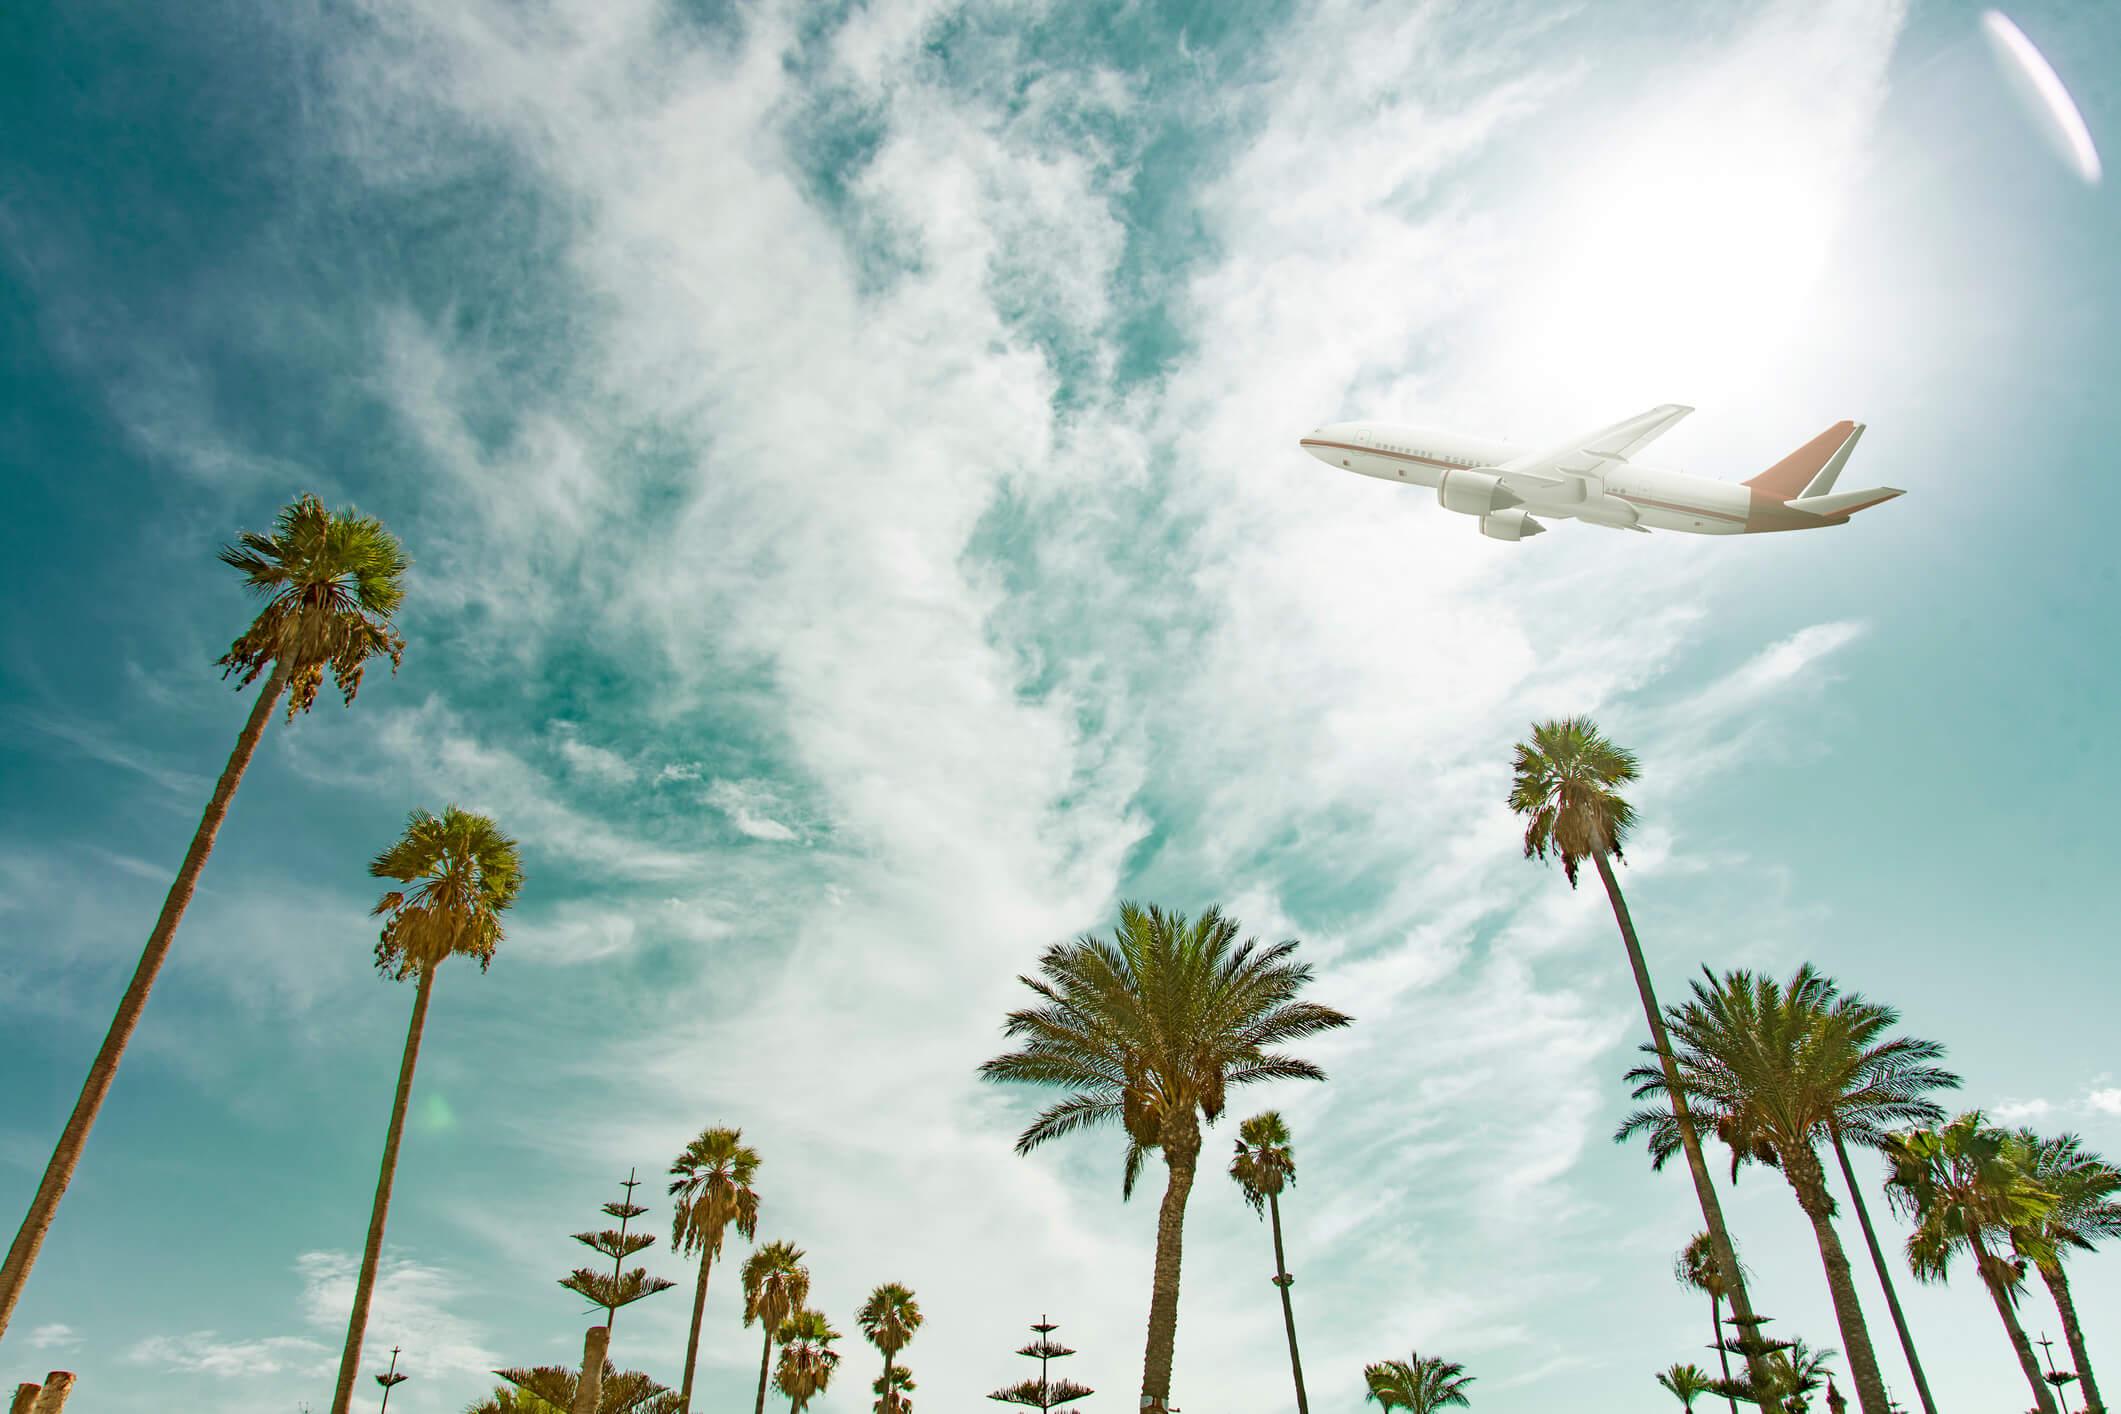 Flugzeug fliegt über Palmen hinweg.